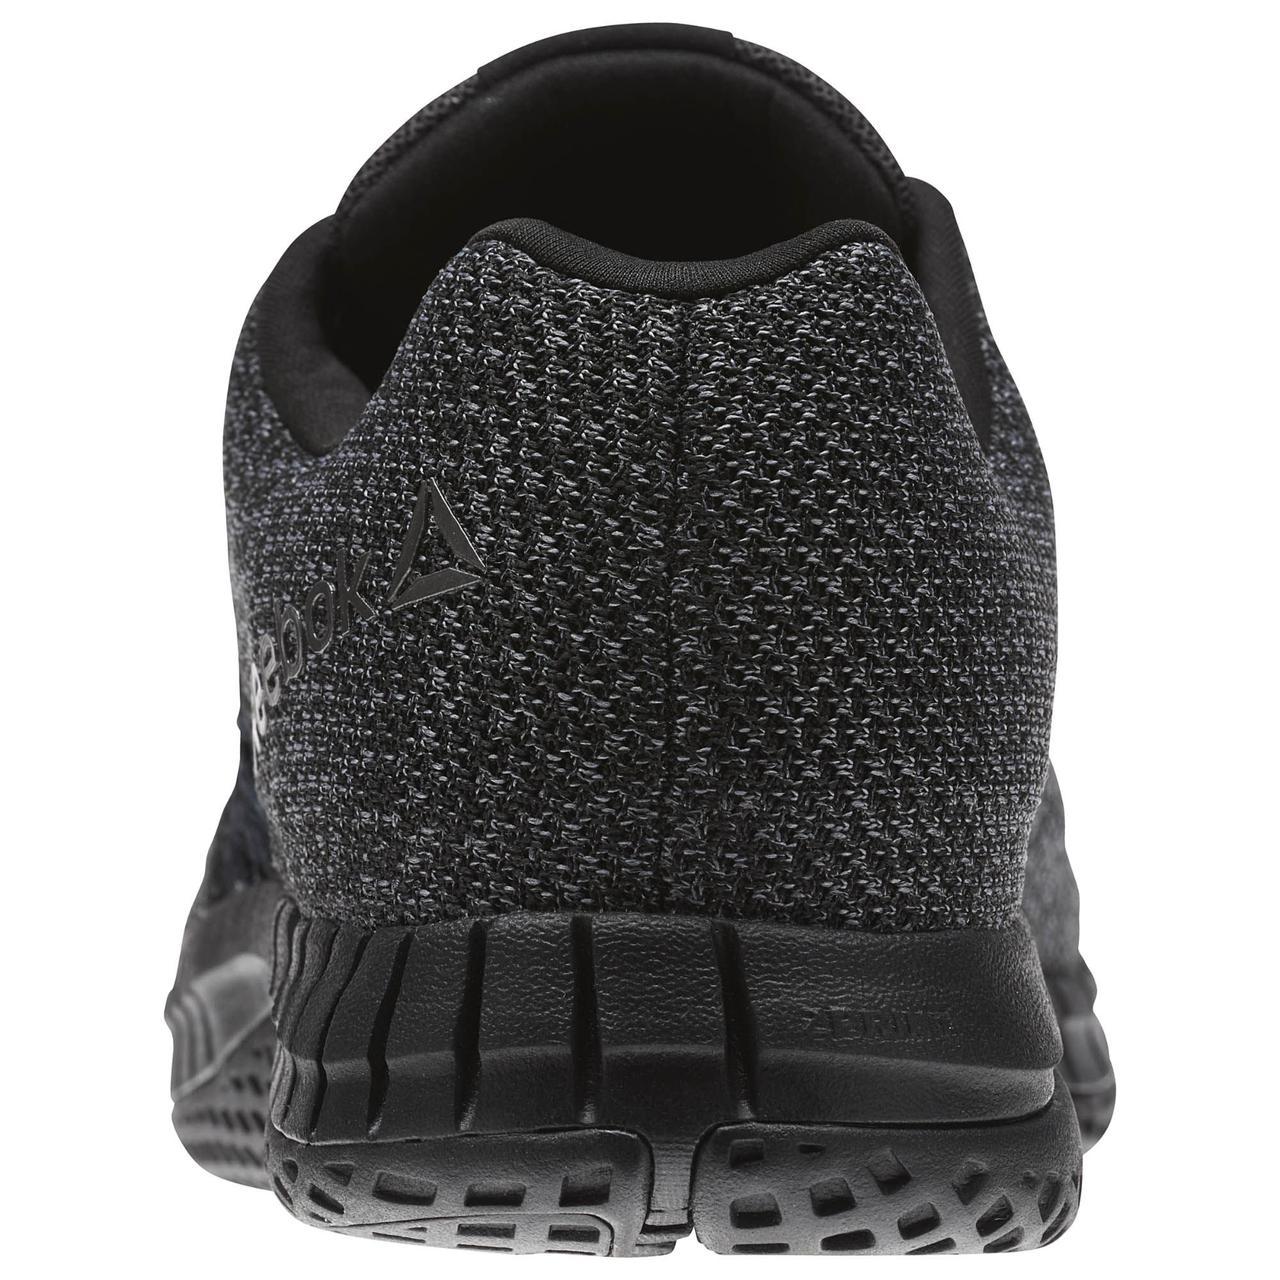 64d54995 Купить Мужские кроссовки Reebok Print Run (Артикул: CN1113) в ...